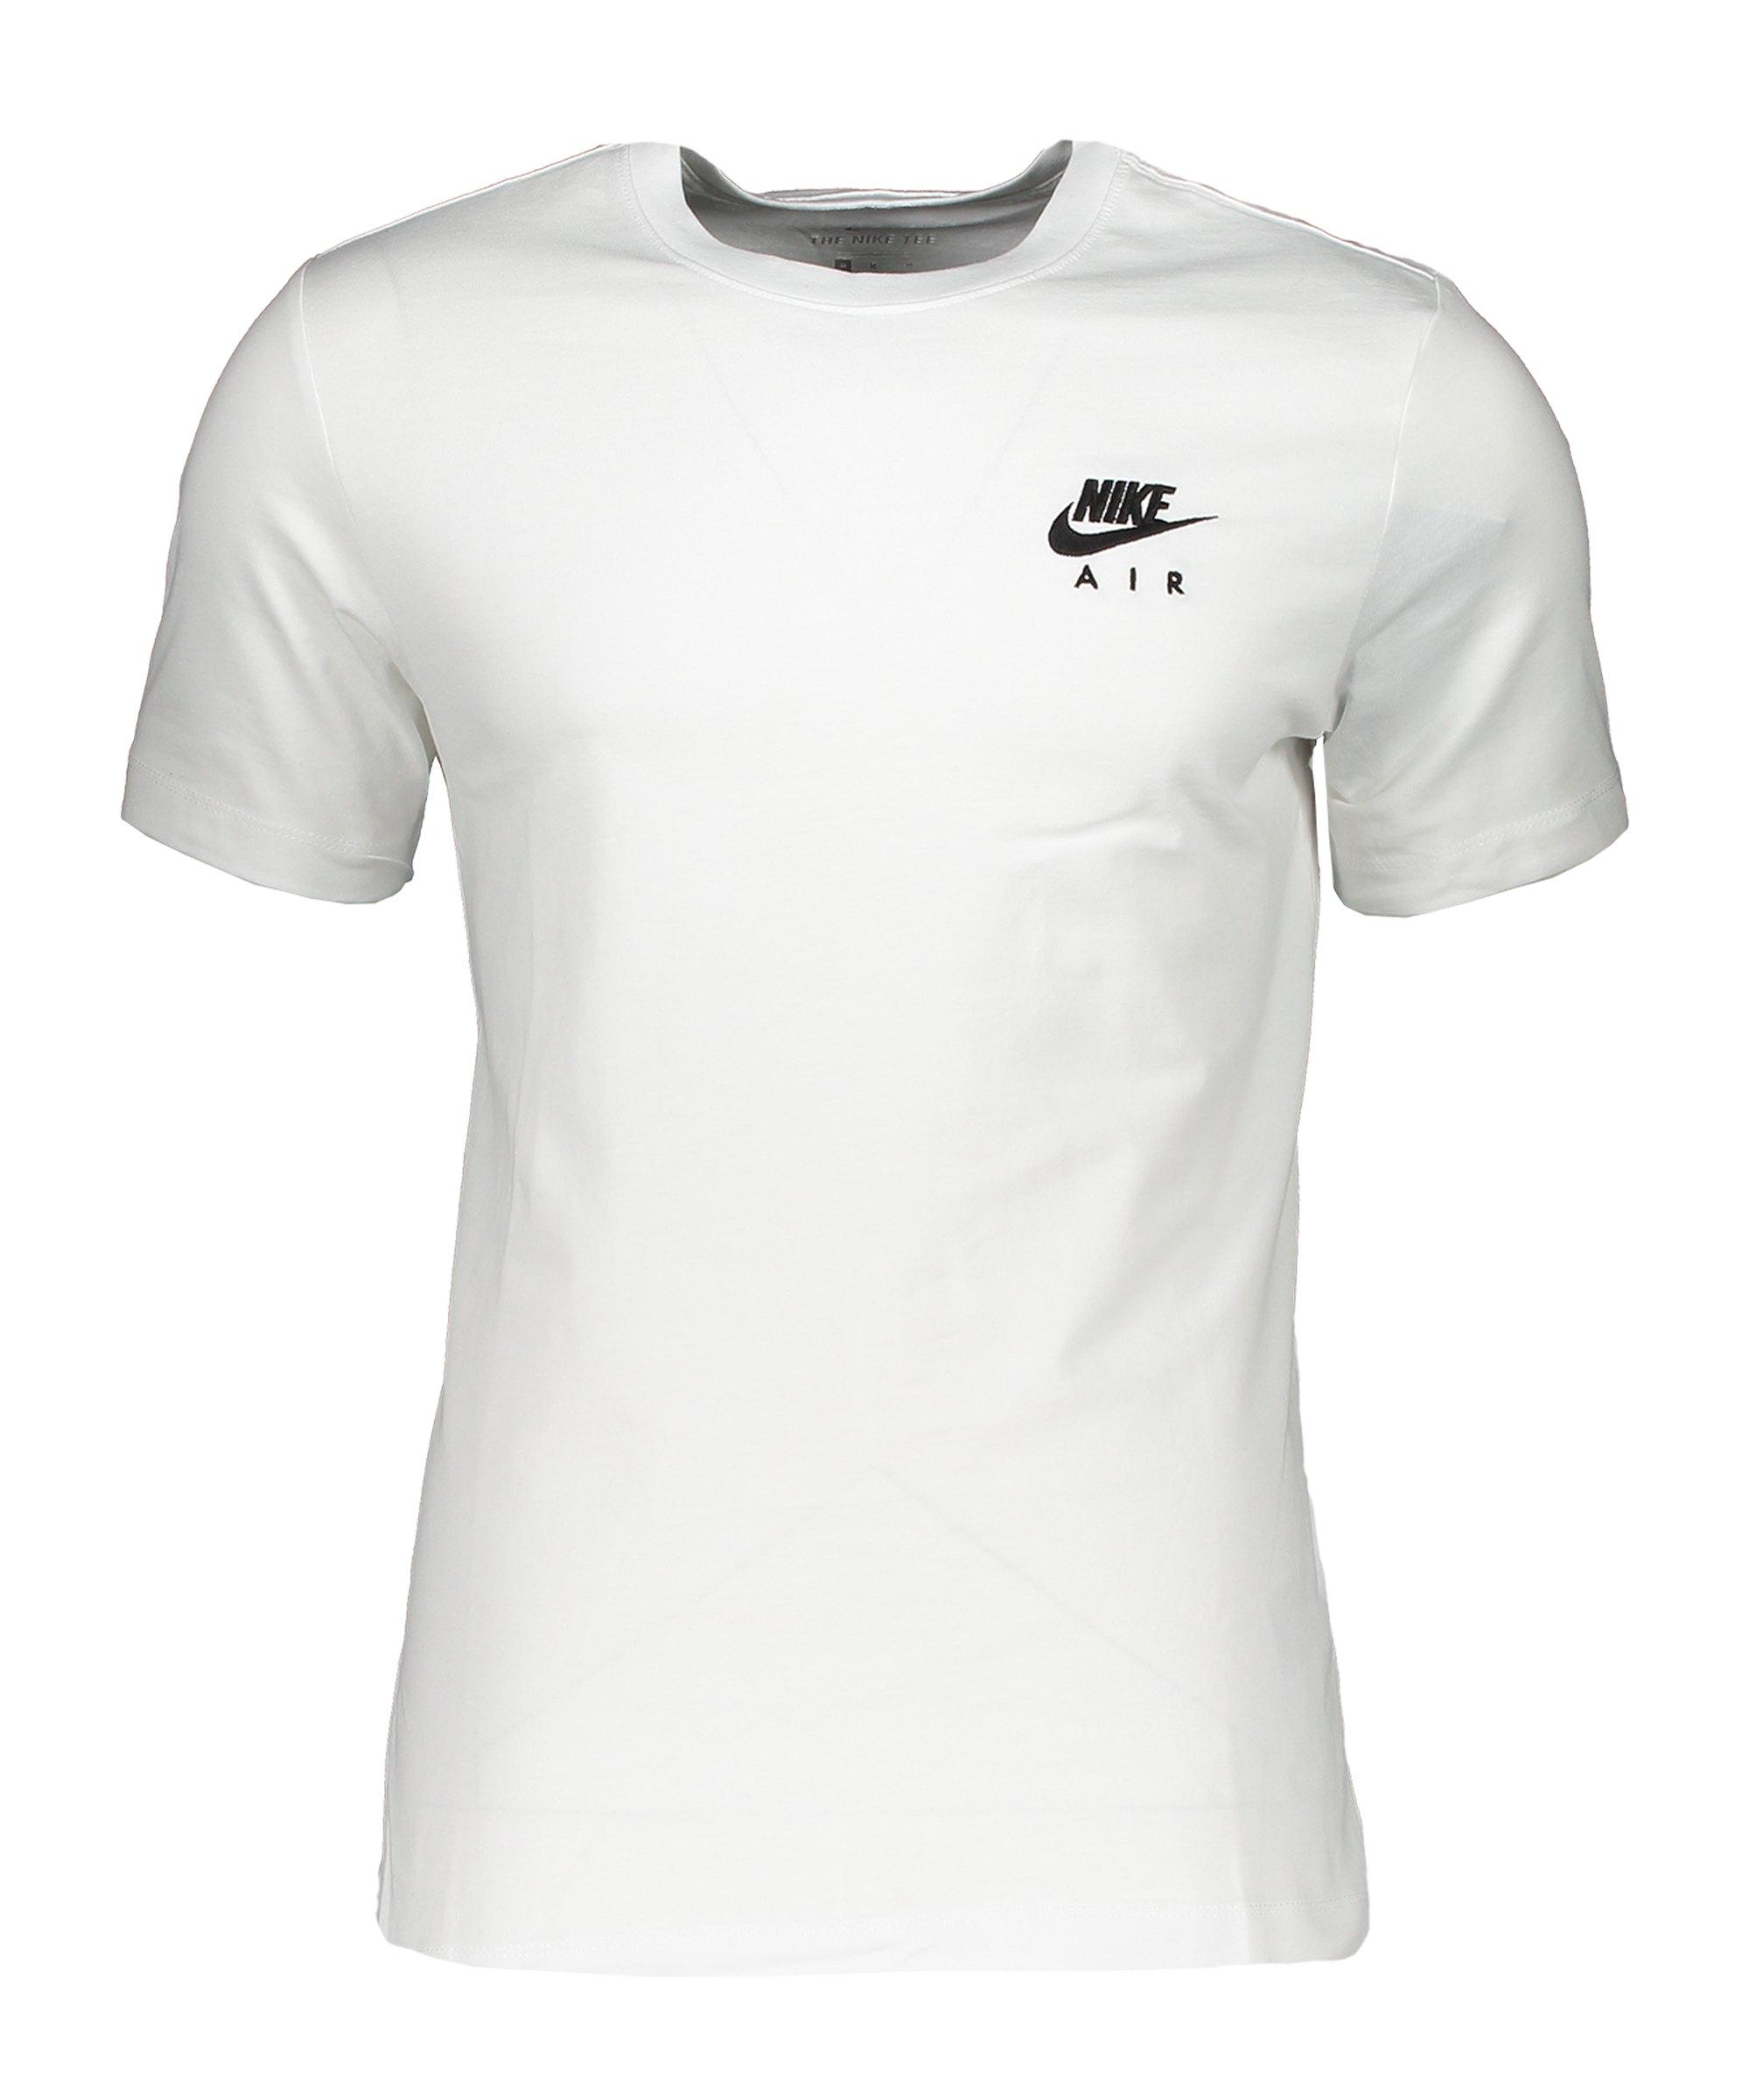 Nike Graphic T-Shirt Weiss F100 - weiss